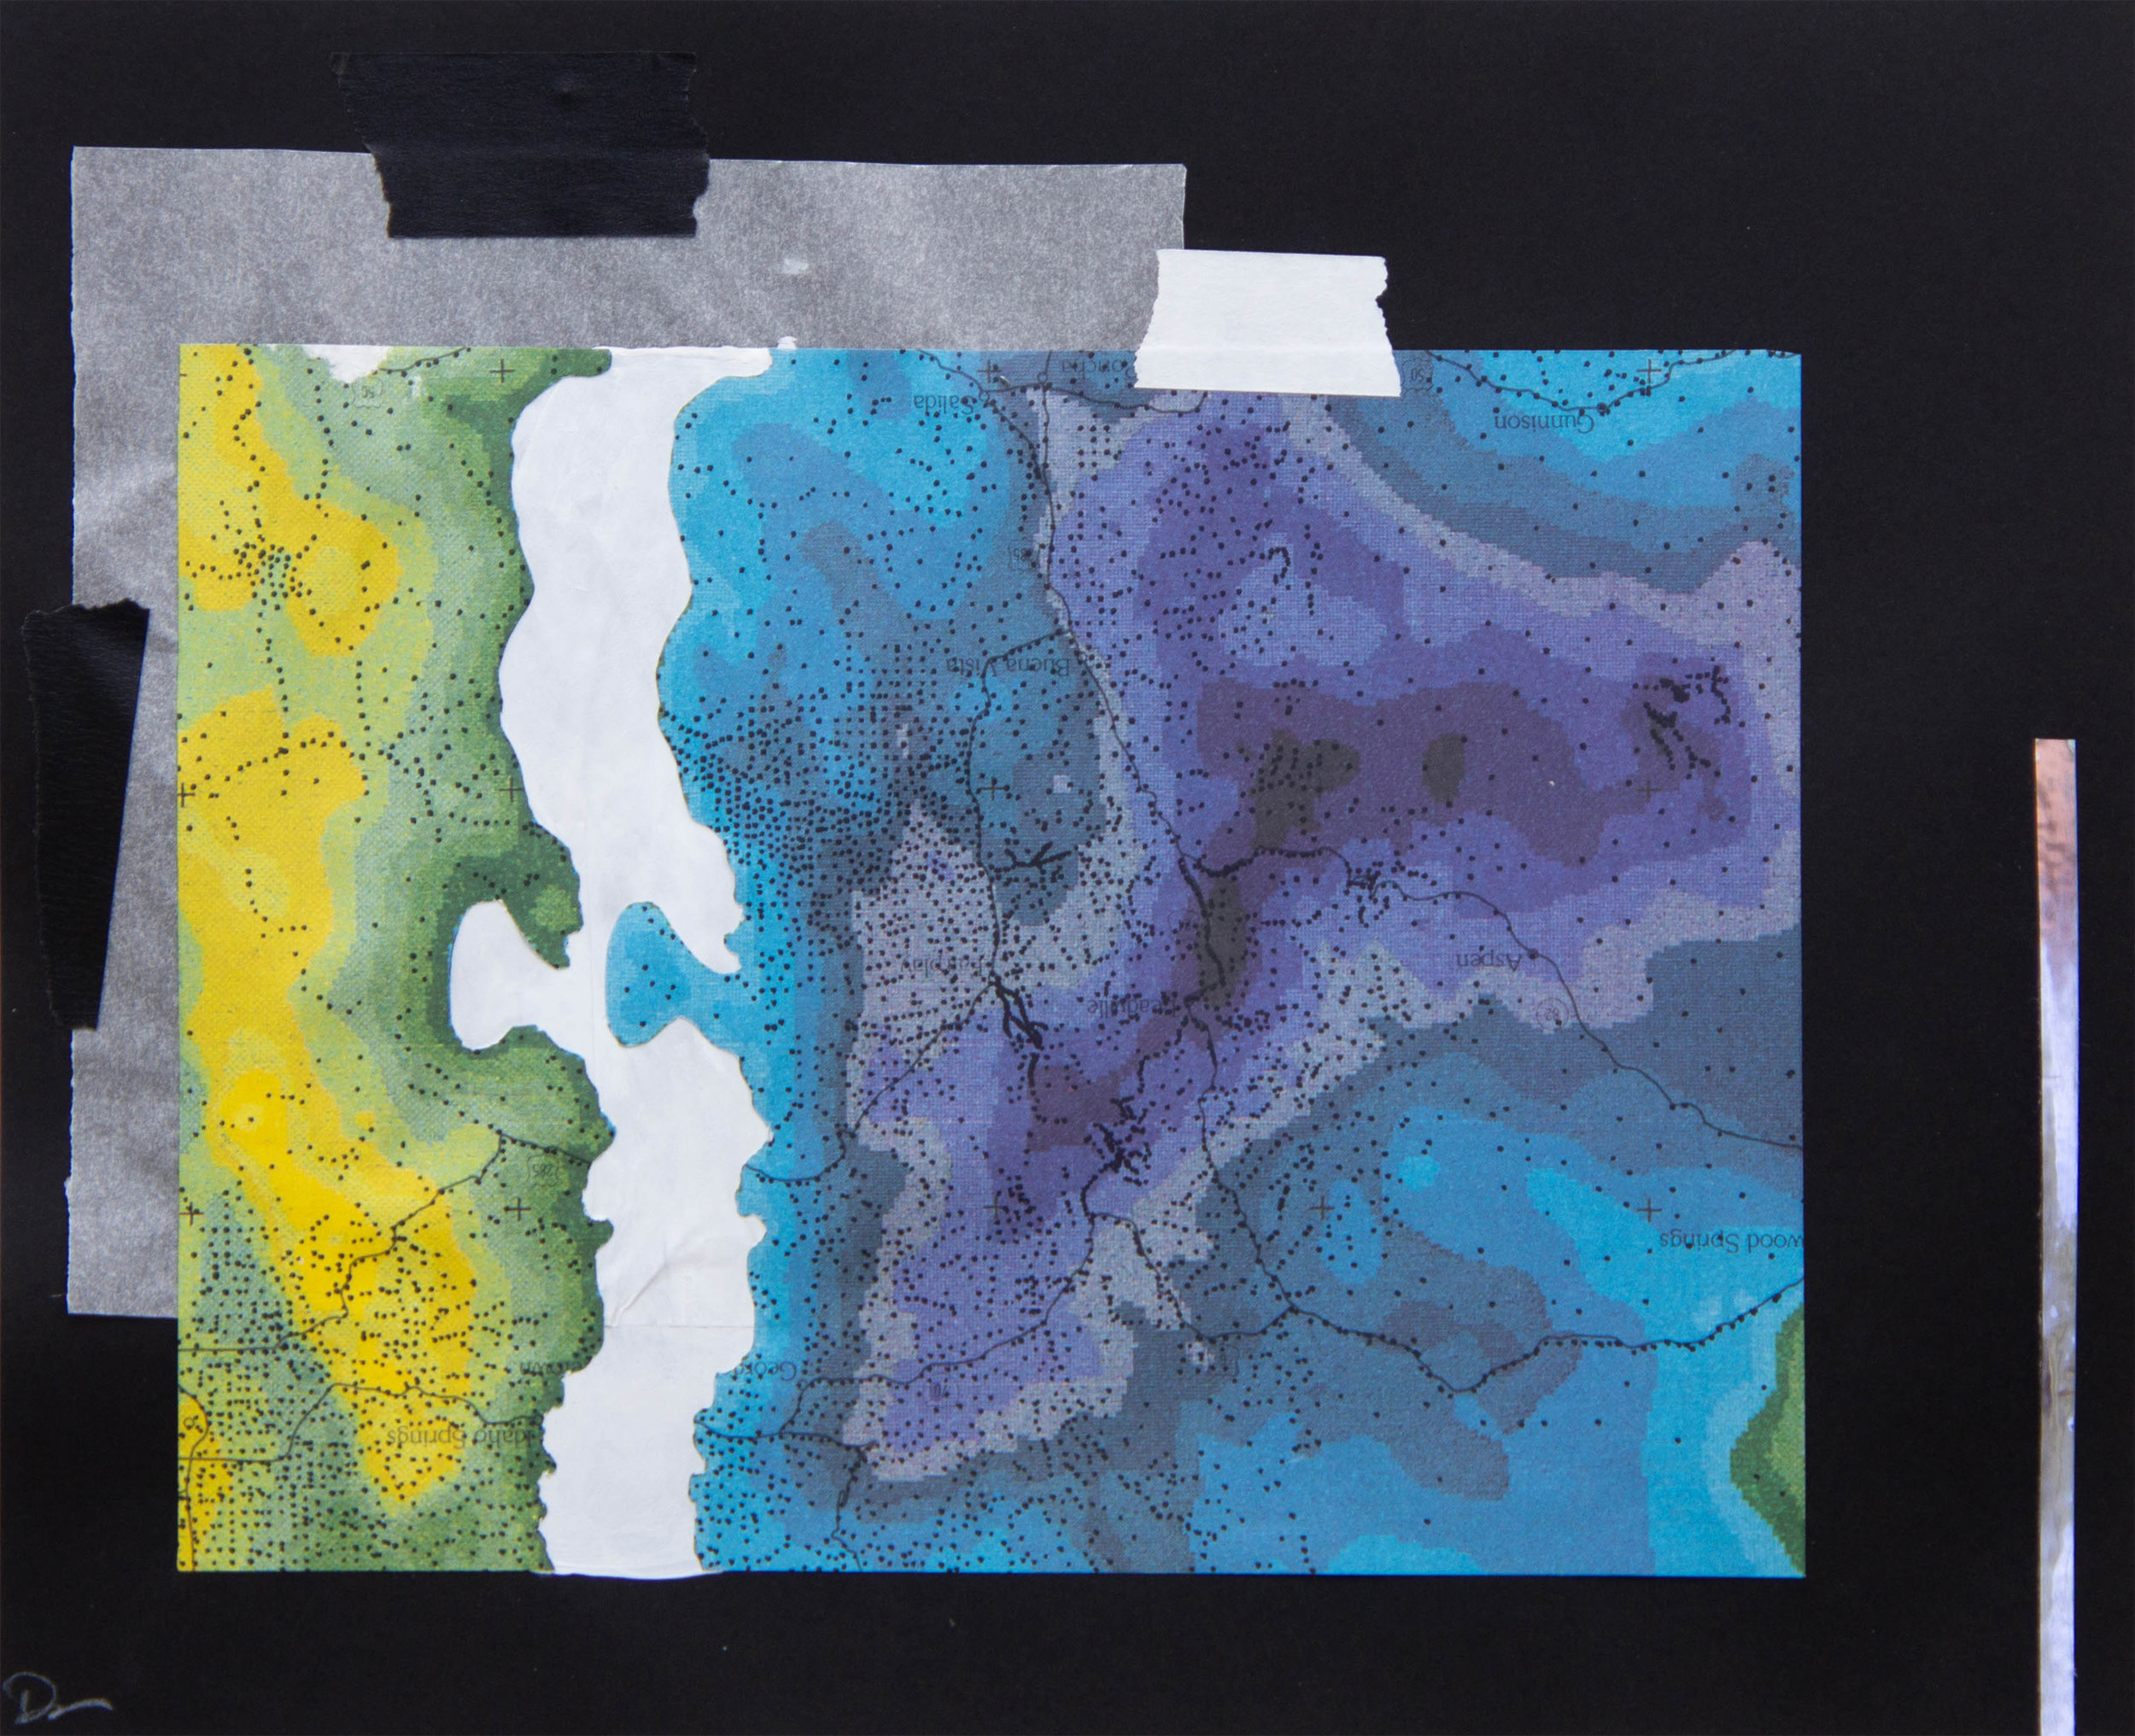 Celestial Topography no. 3